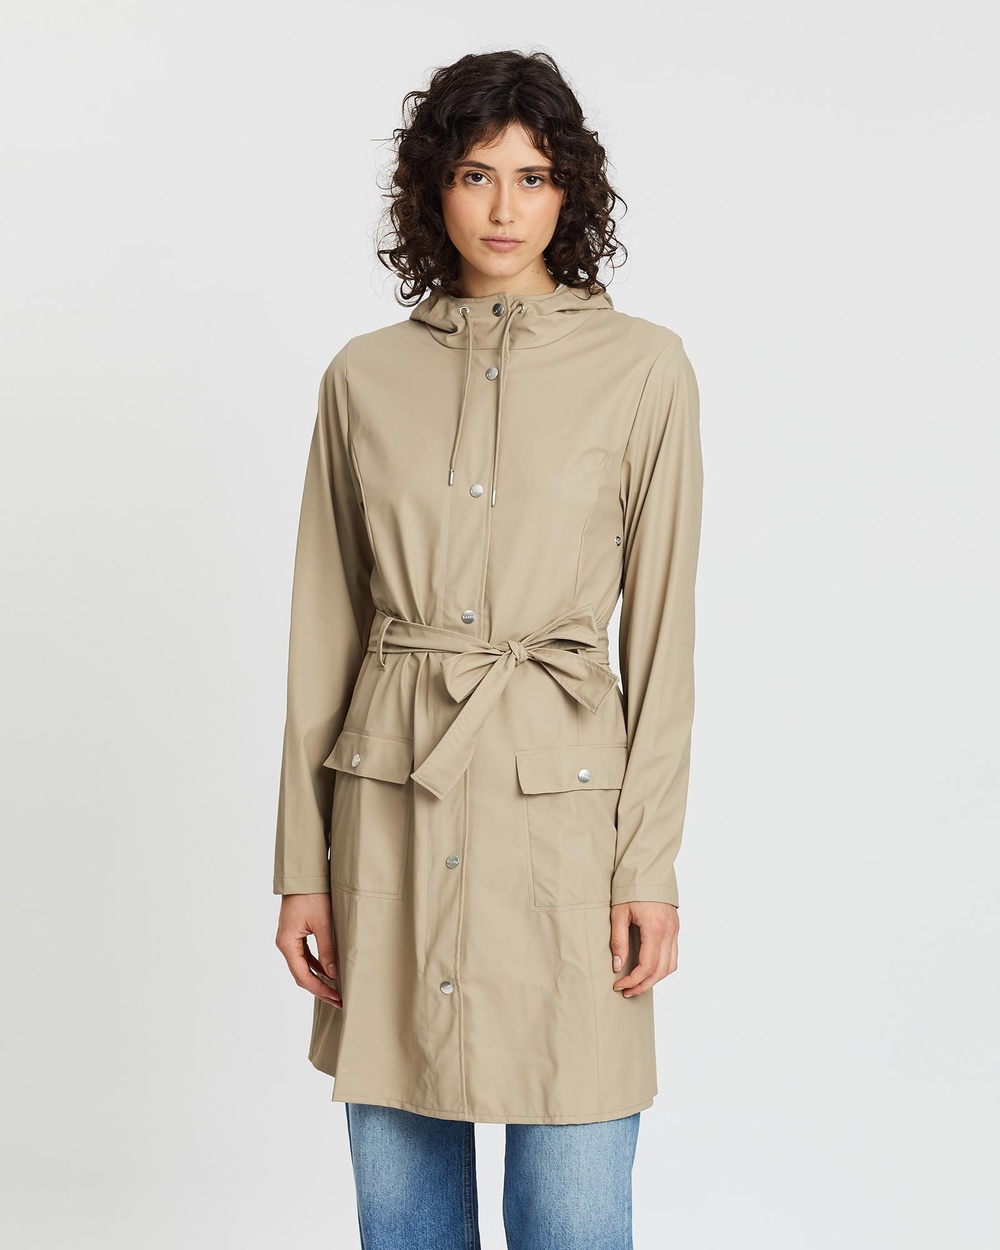 RAINS Curve Jacket Coats & Jackets Beige